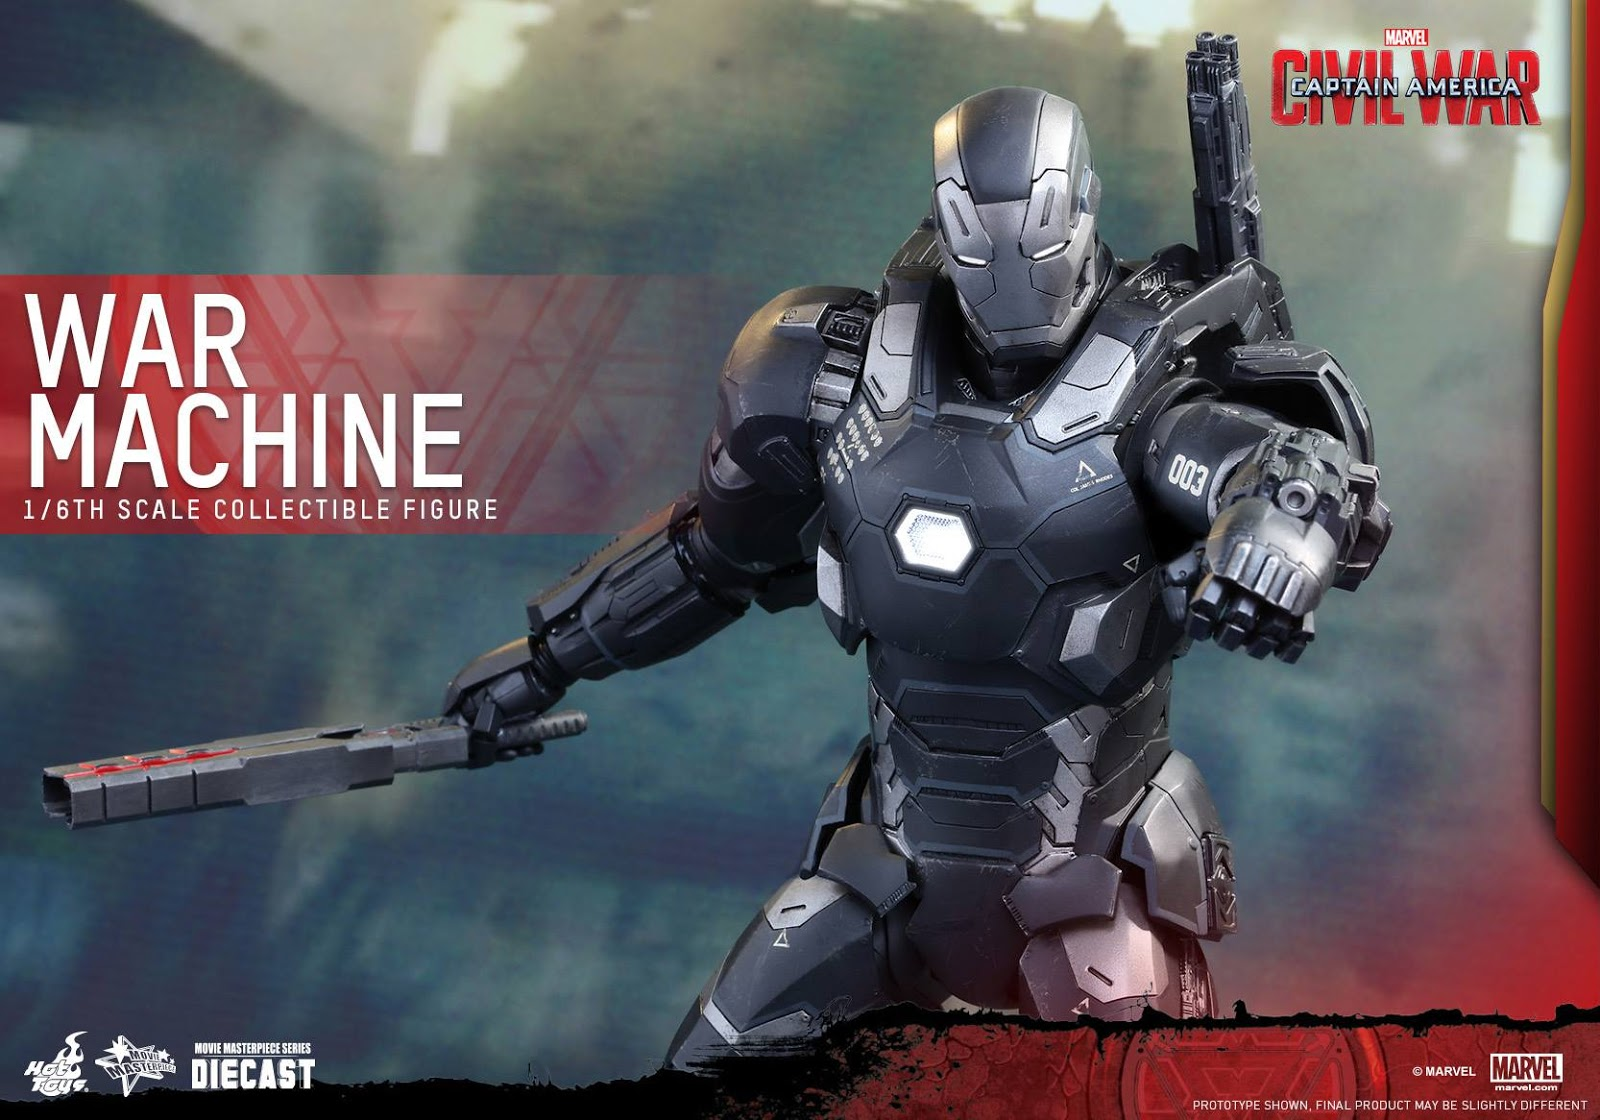 HD Images 1080p Captain America Civil War HD Wallpapers 1600x1120